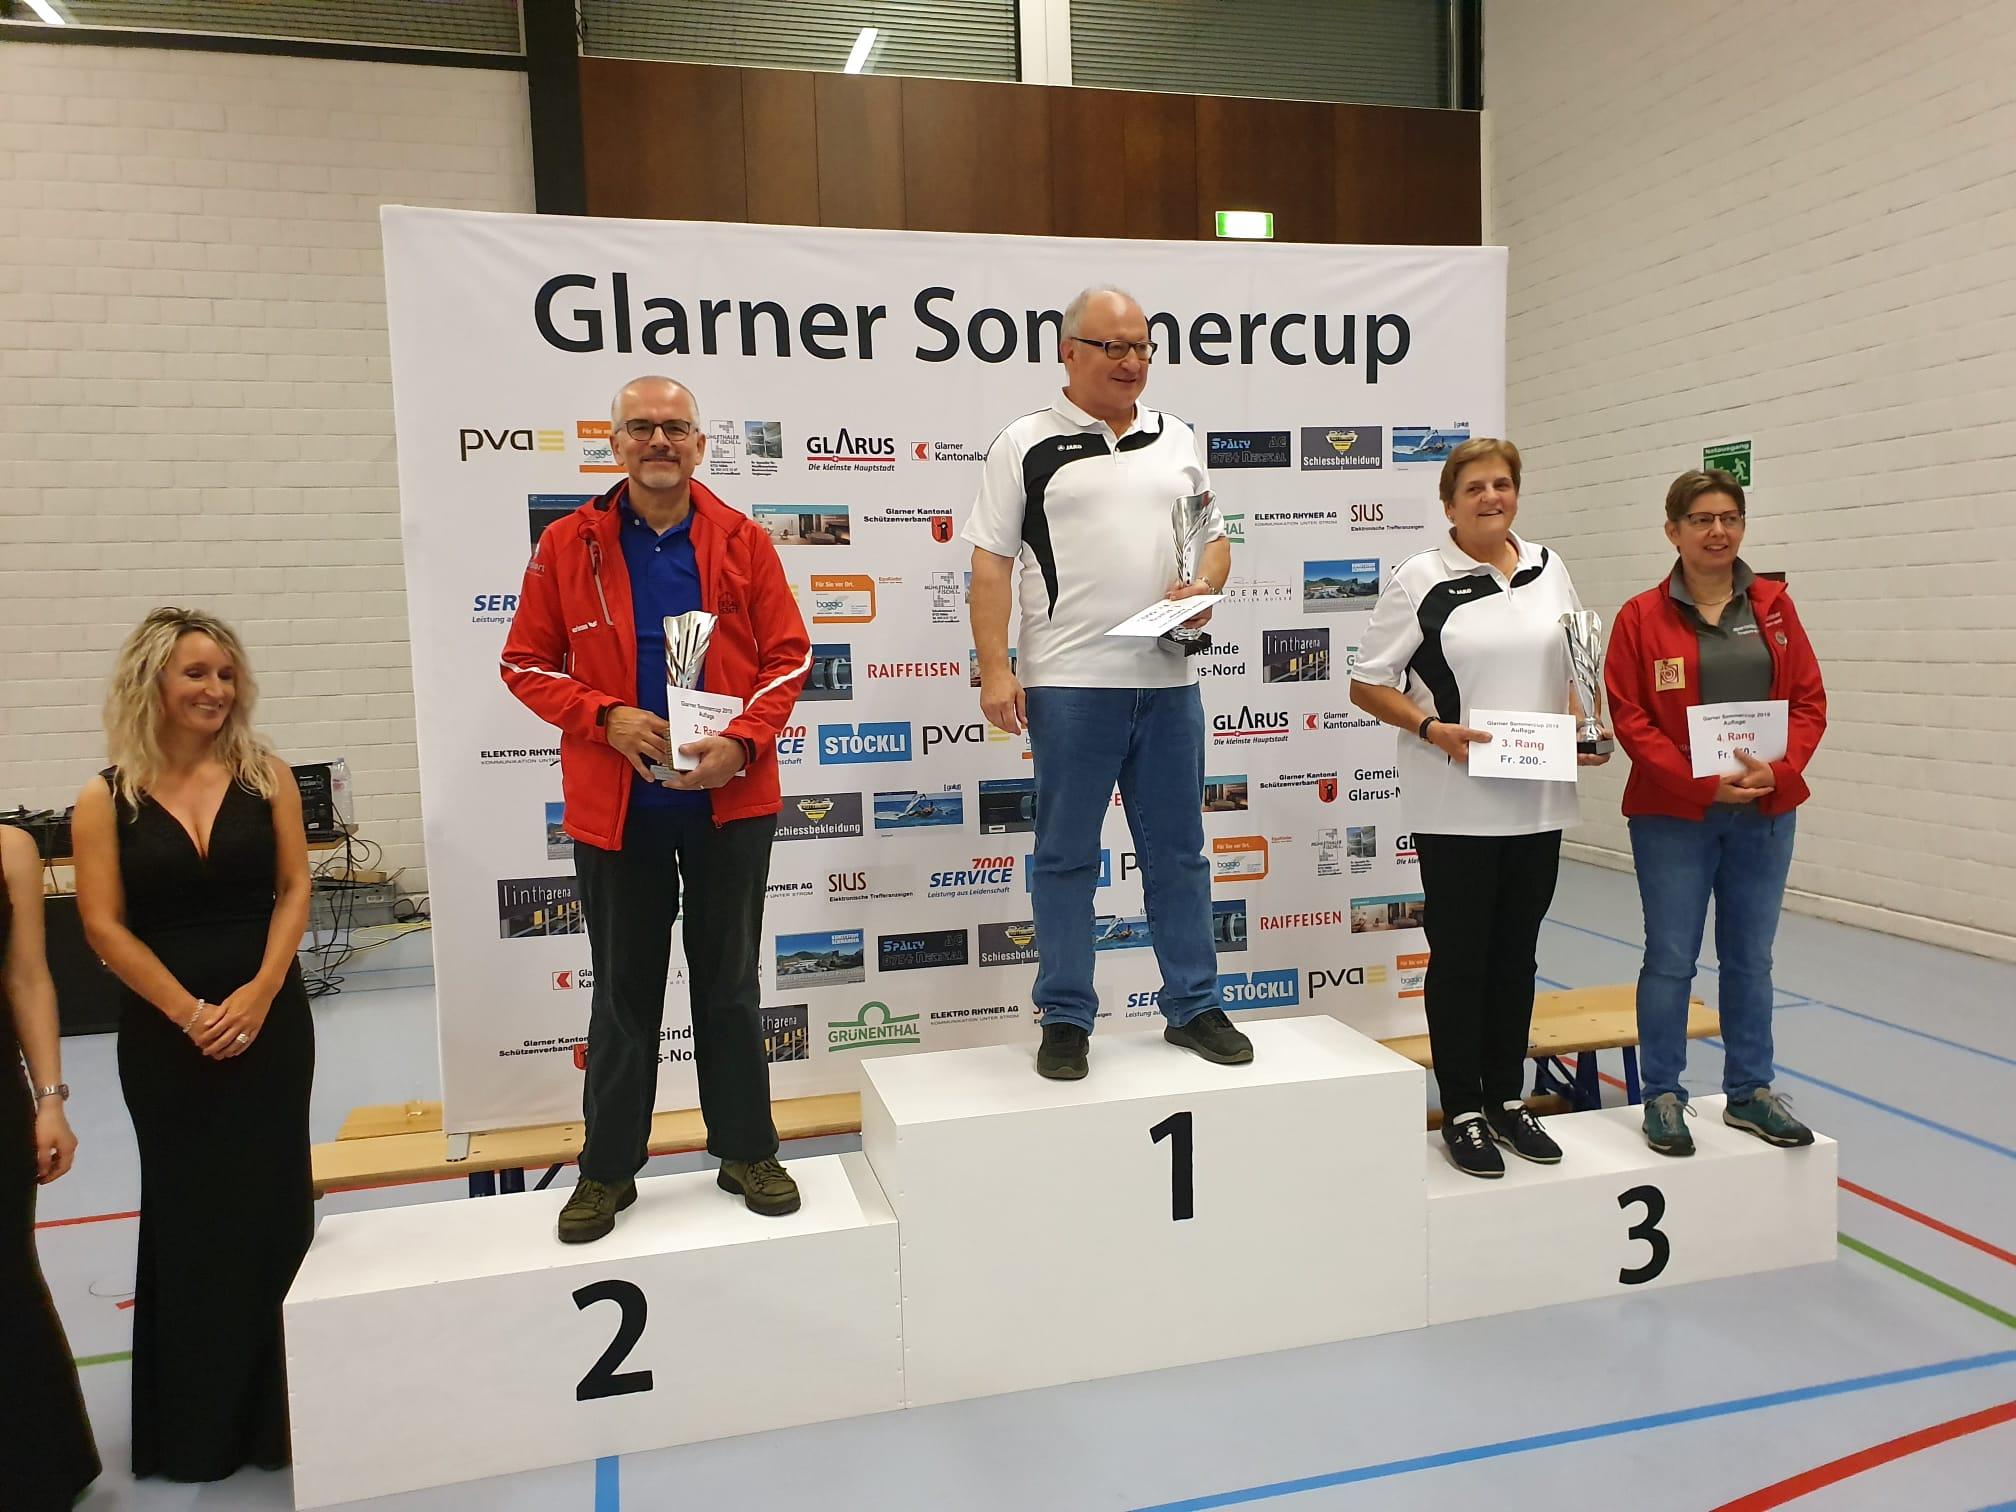 4. Rang Glarner Sommercup 2019